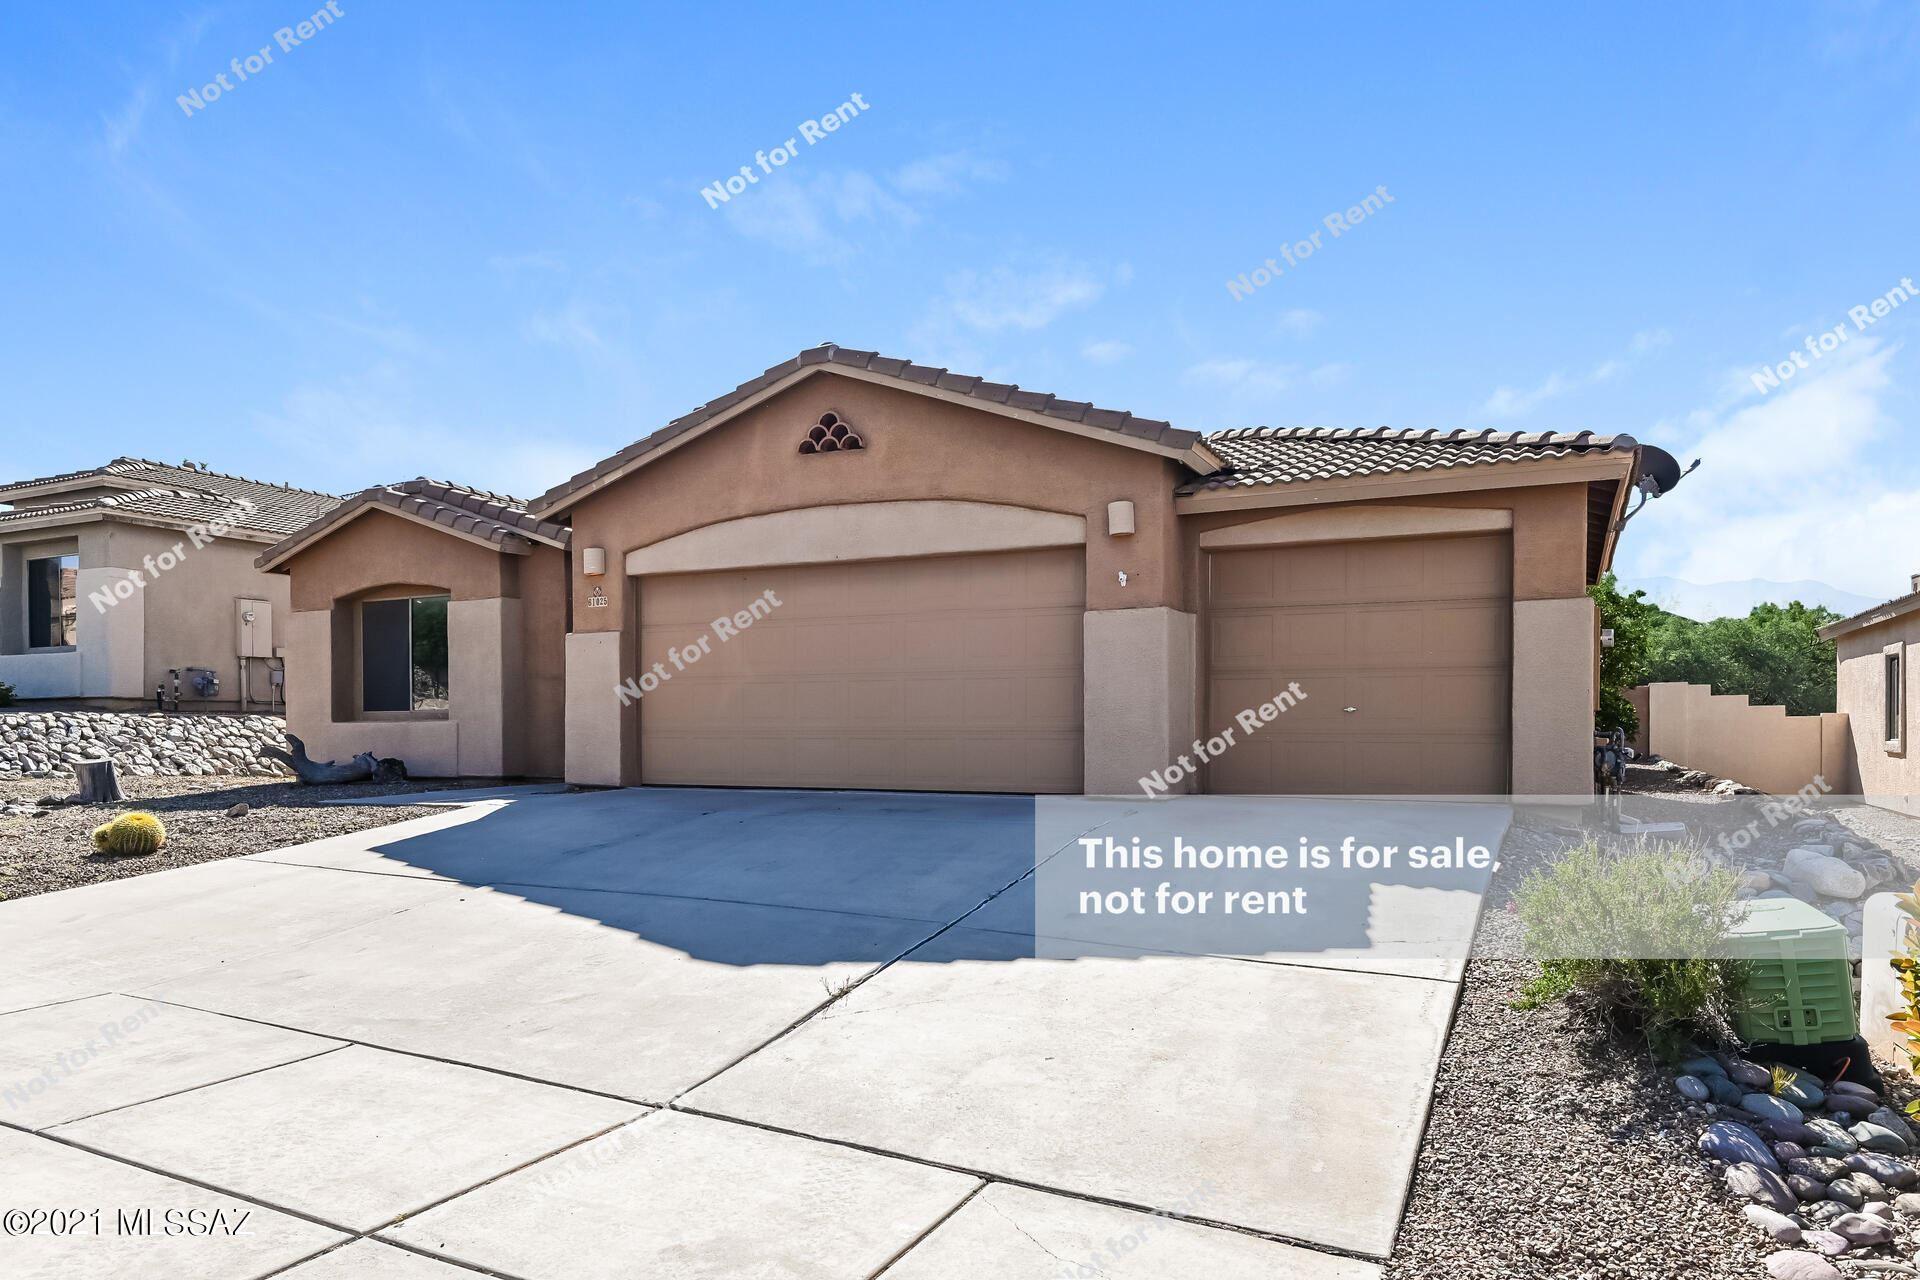 61025 E Eagle Heights Drive, Tucson, AZ 85739 - MLS#: 22123013